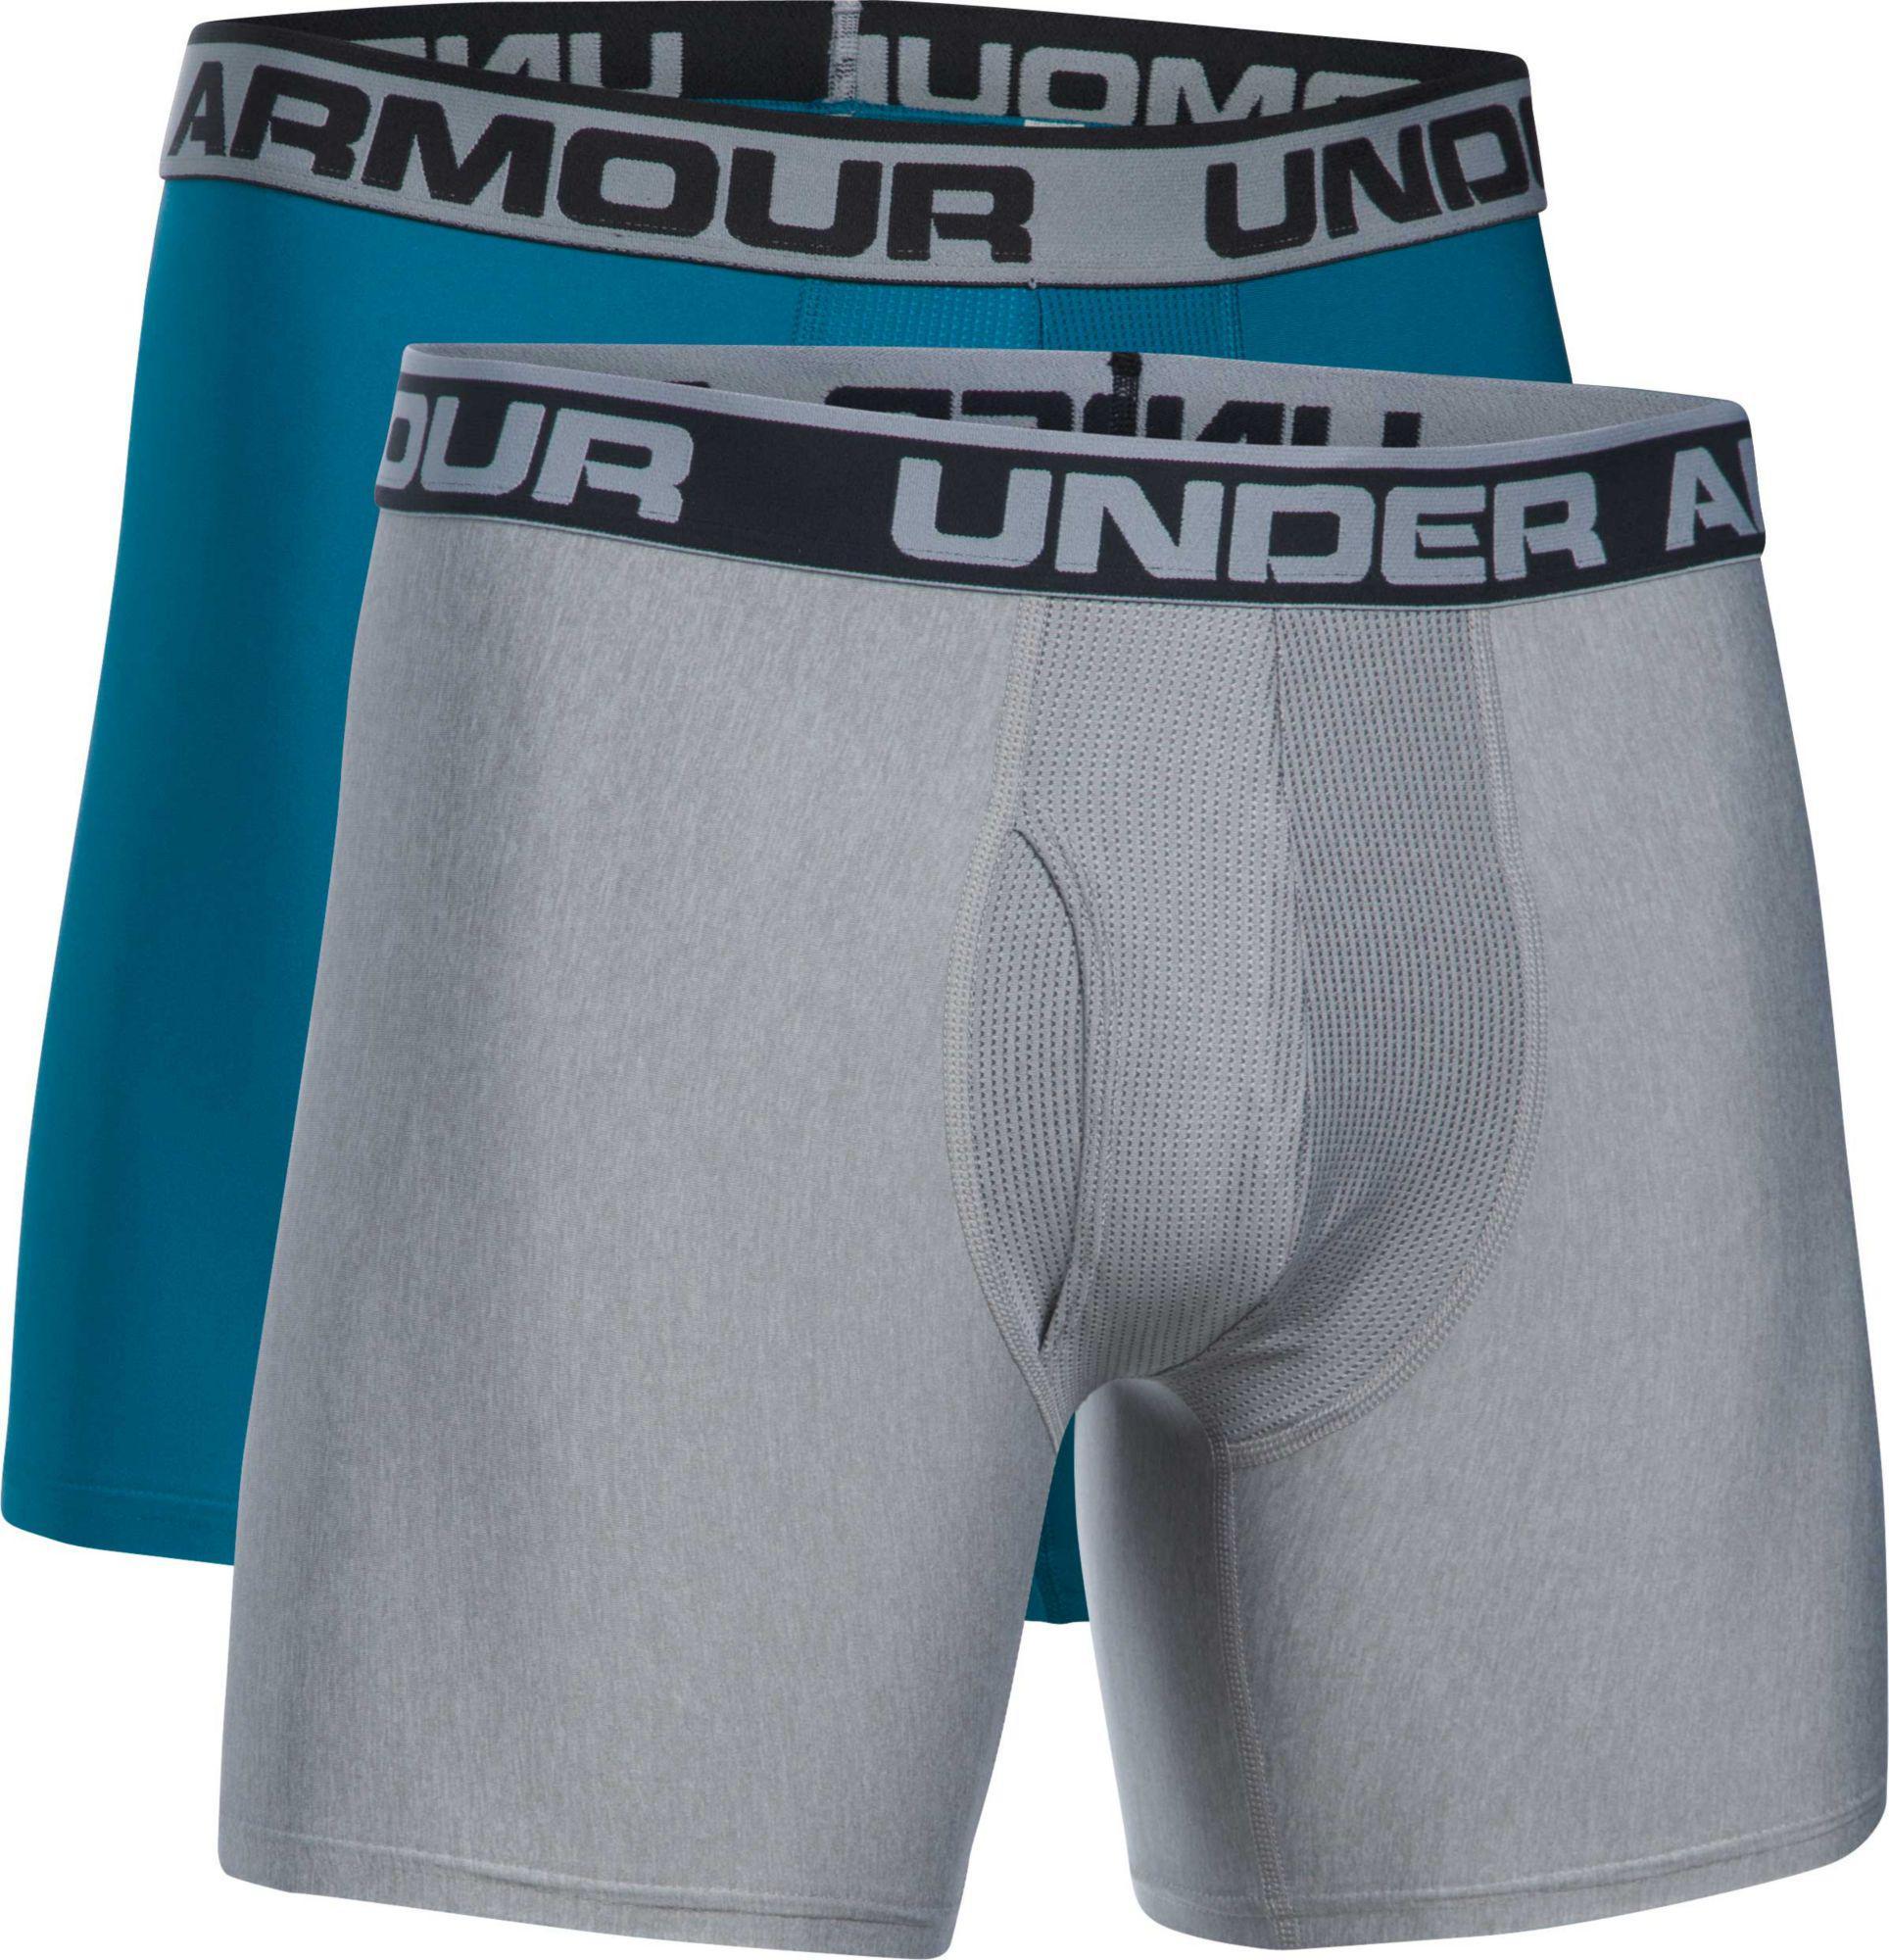 Under Armour Boxer Uomo The Original 6 Boxerjock